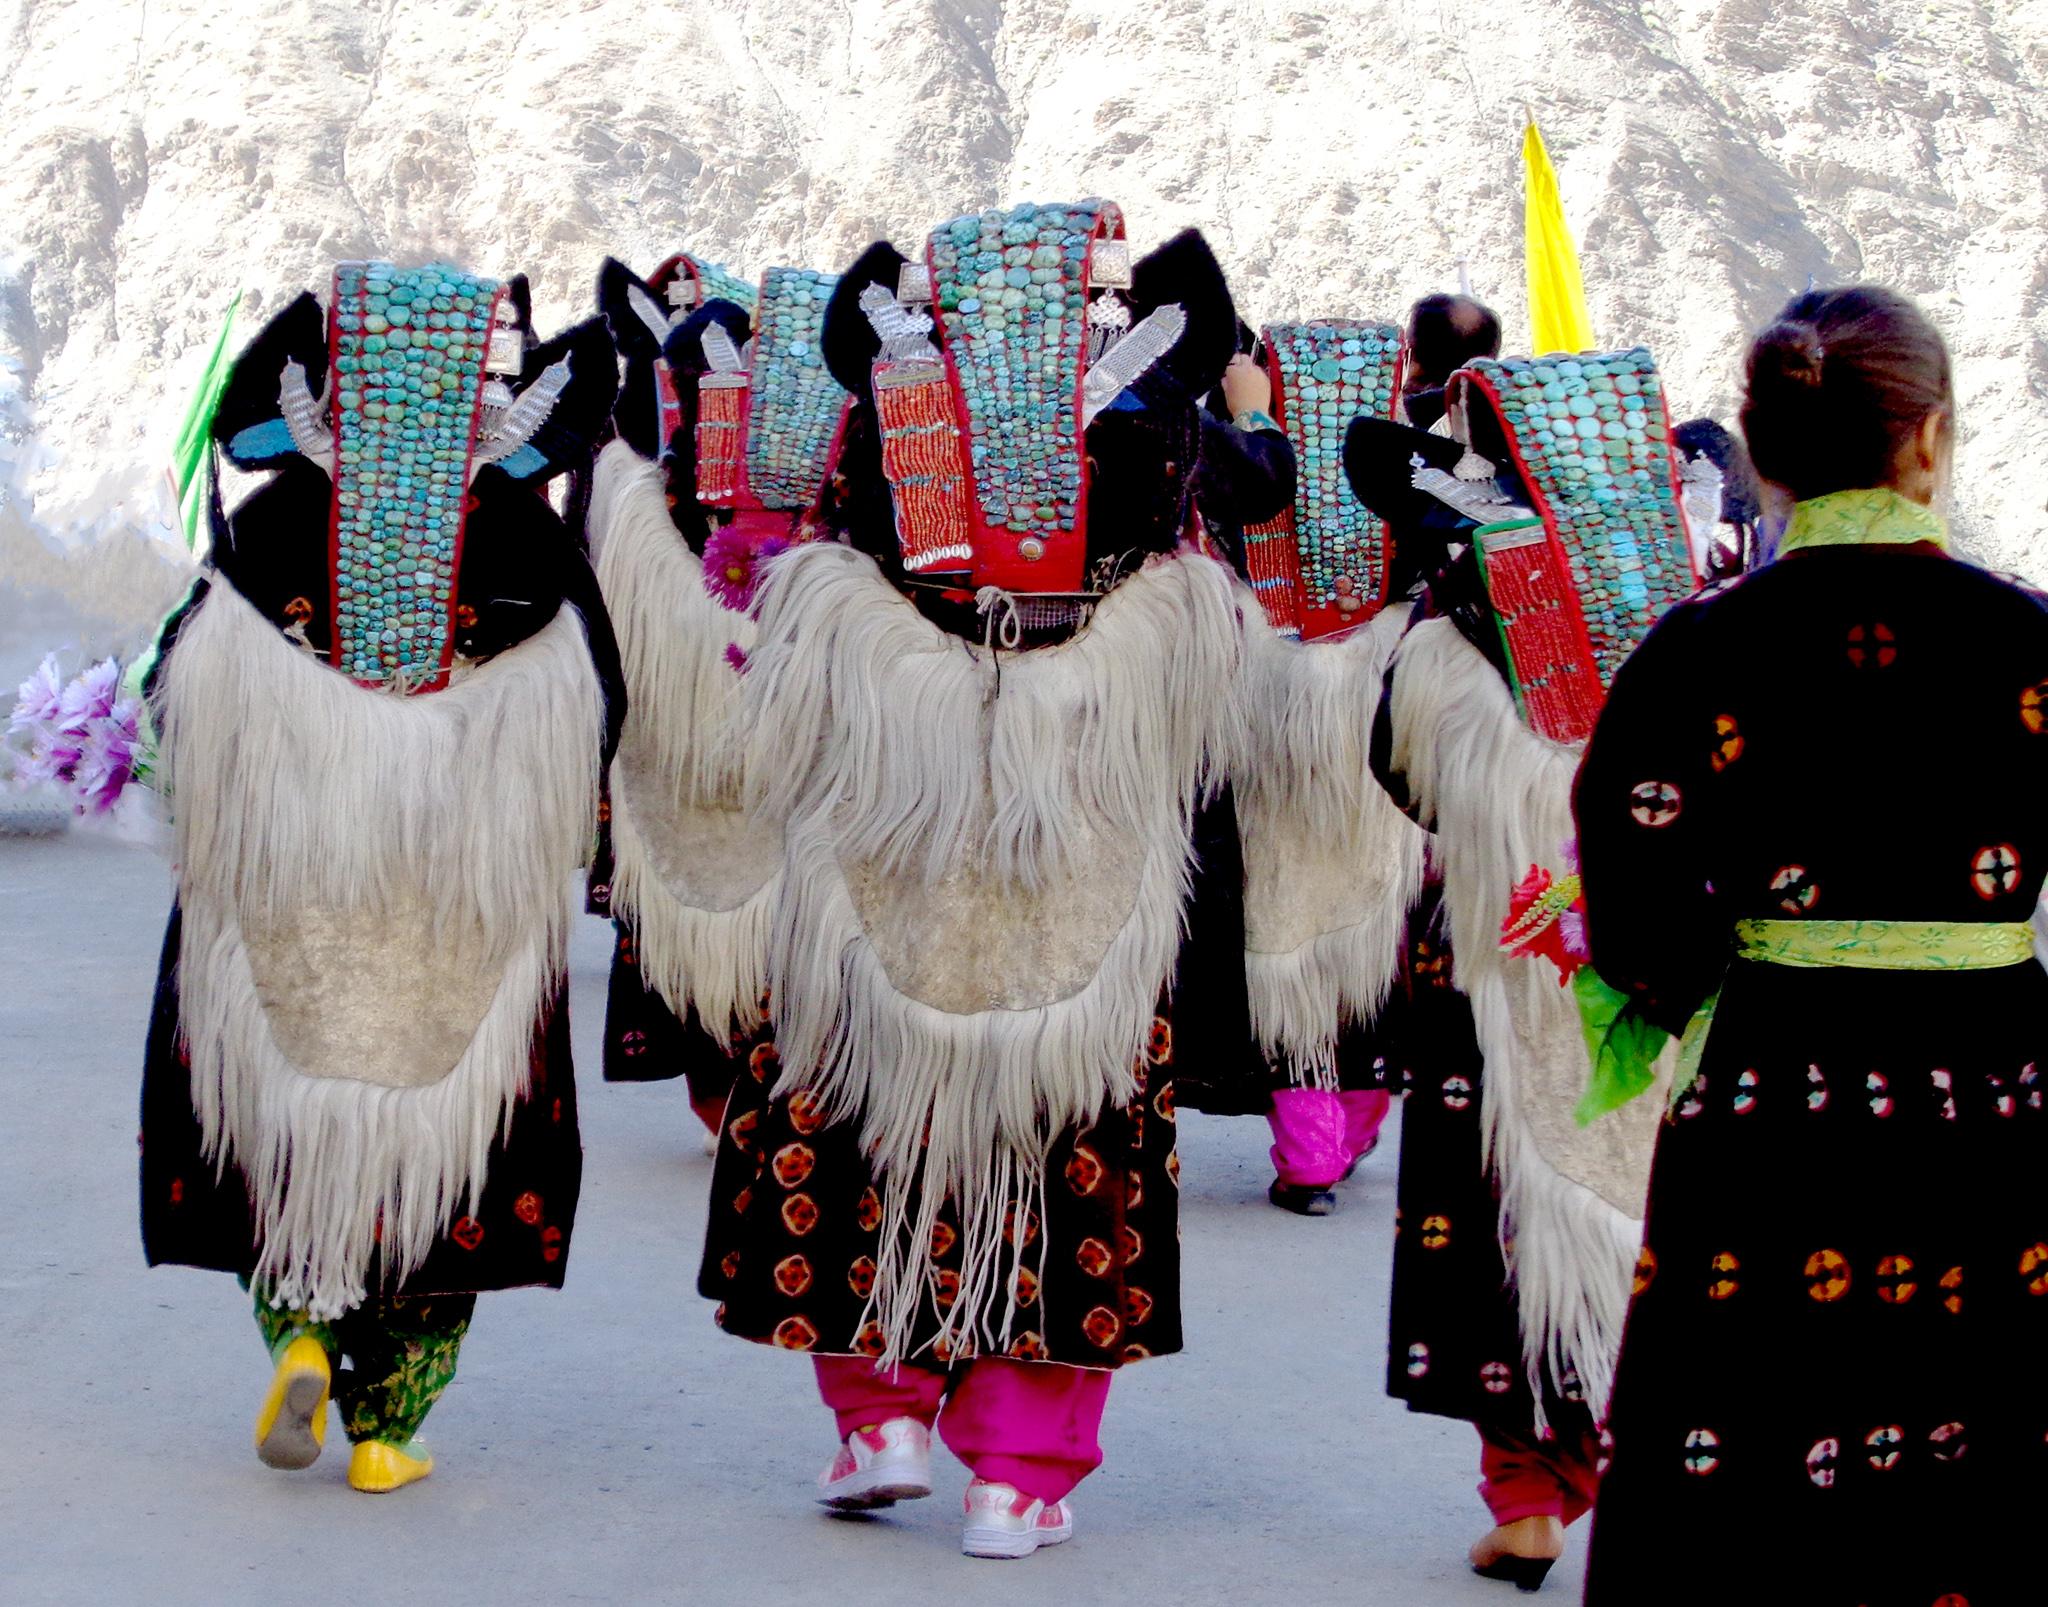 Fête religieuse à Lamayuru Ladakh